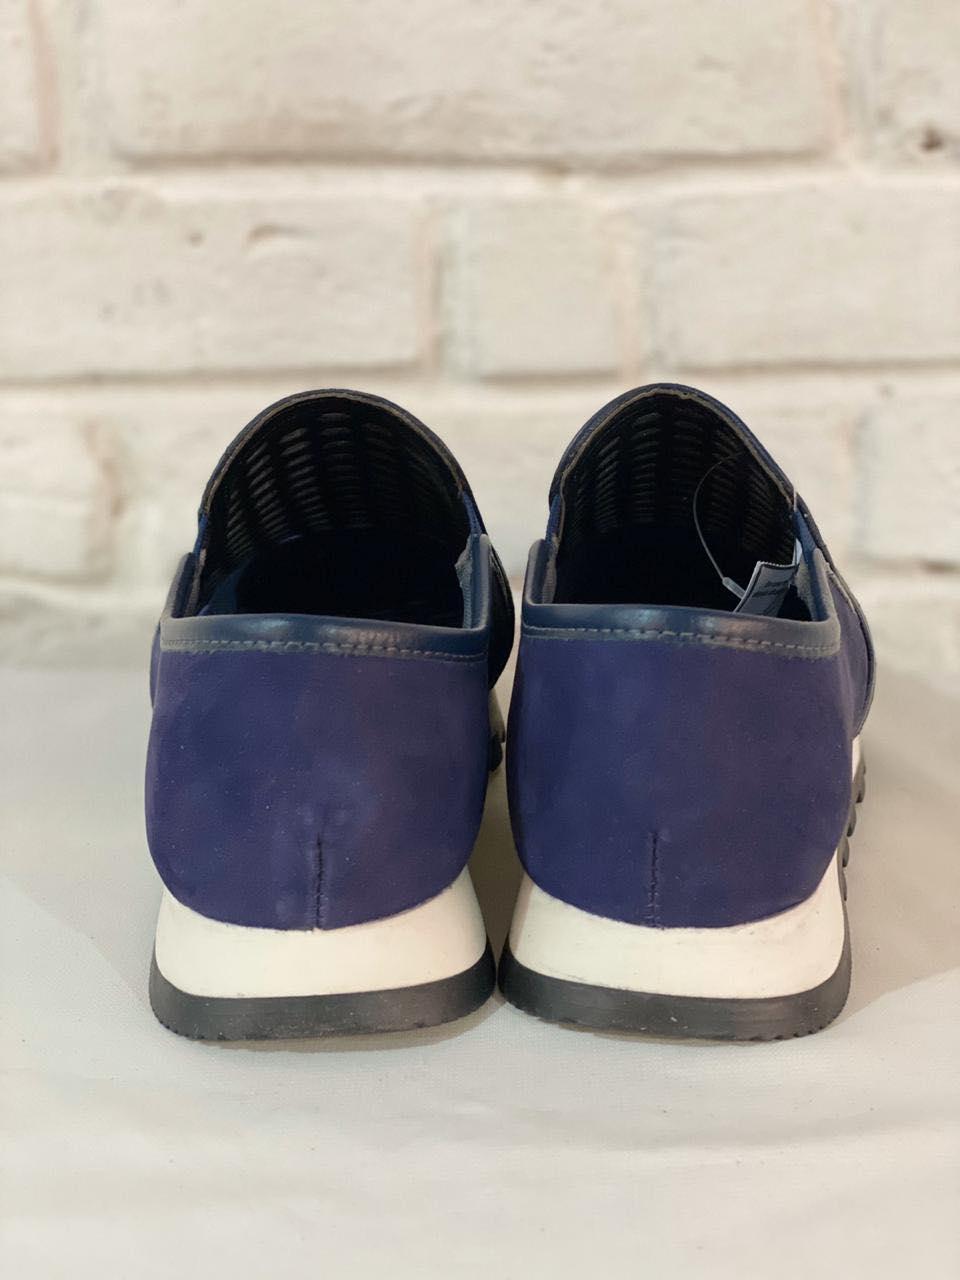 Sapatênis  Feminino Prata Couro 1010320 Azul